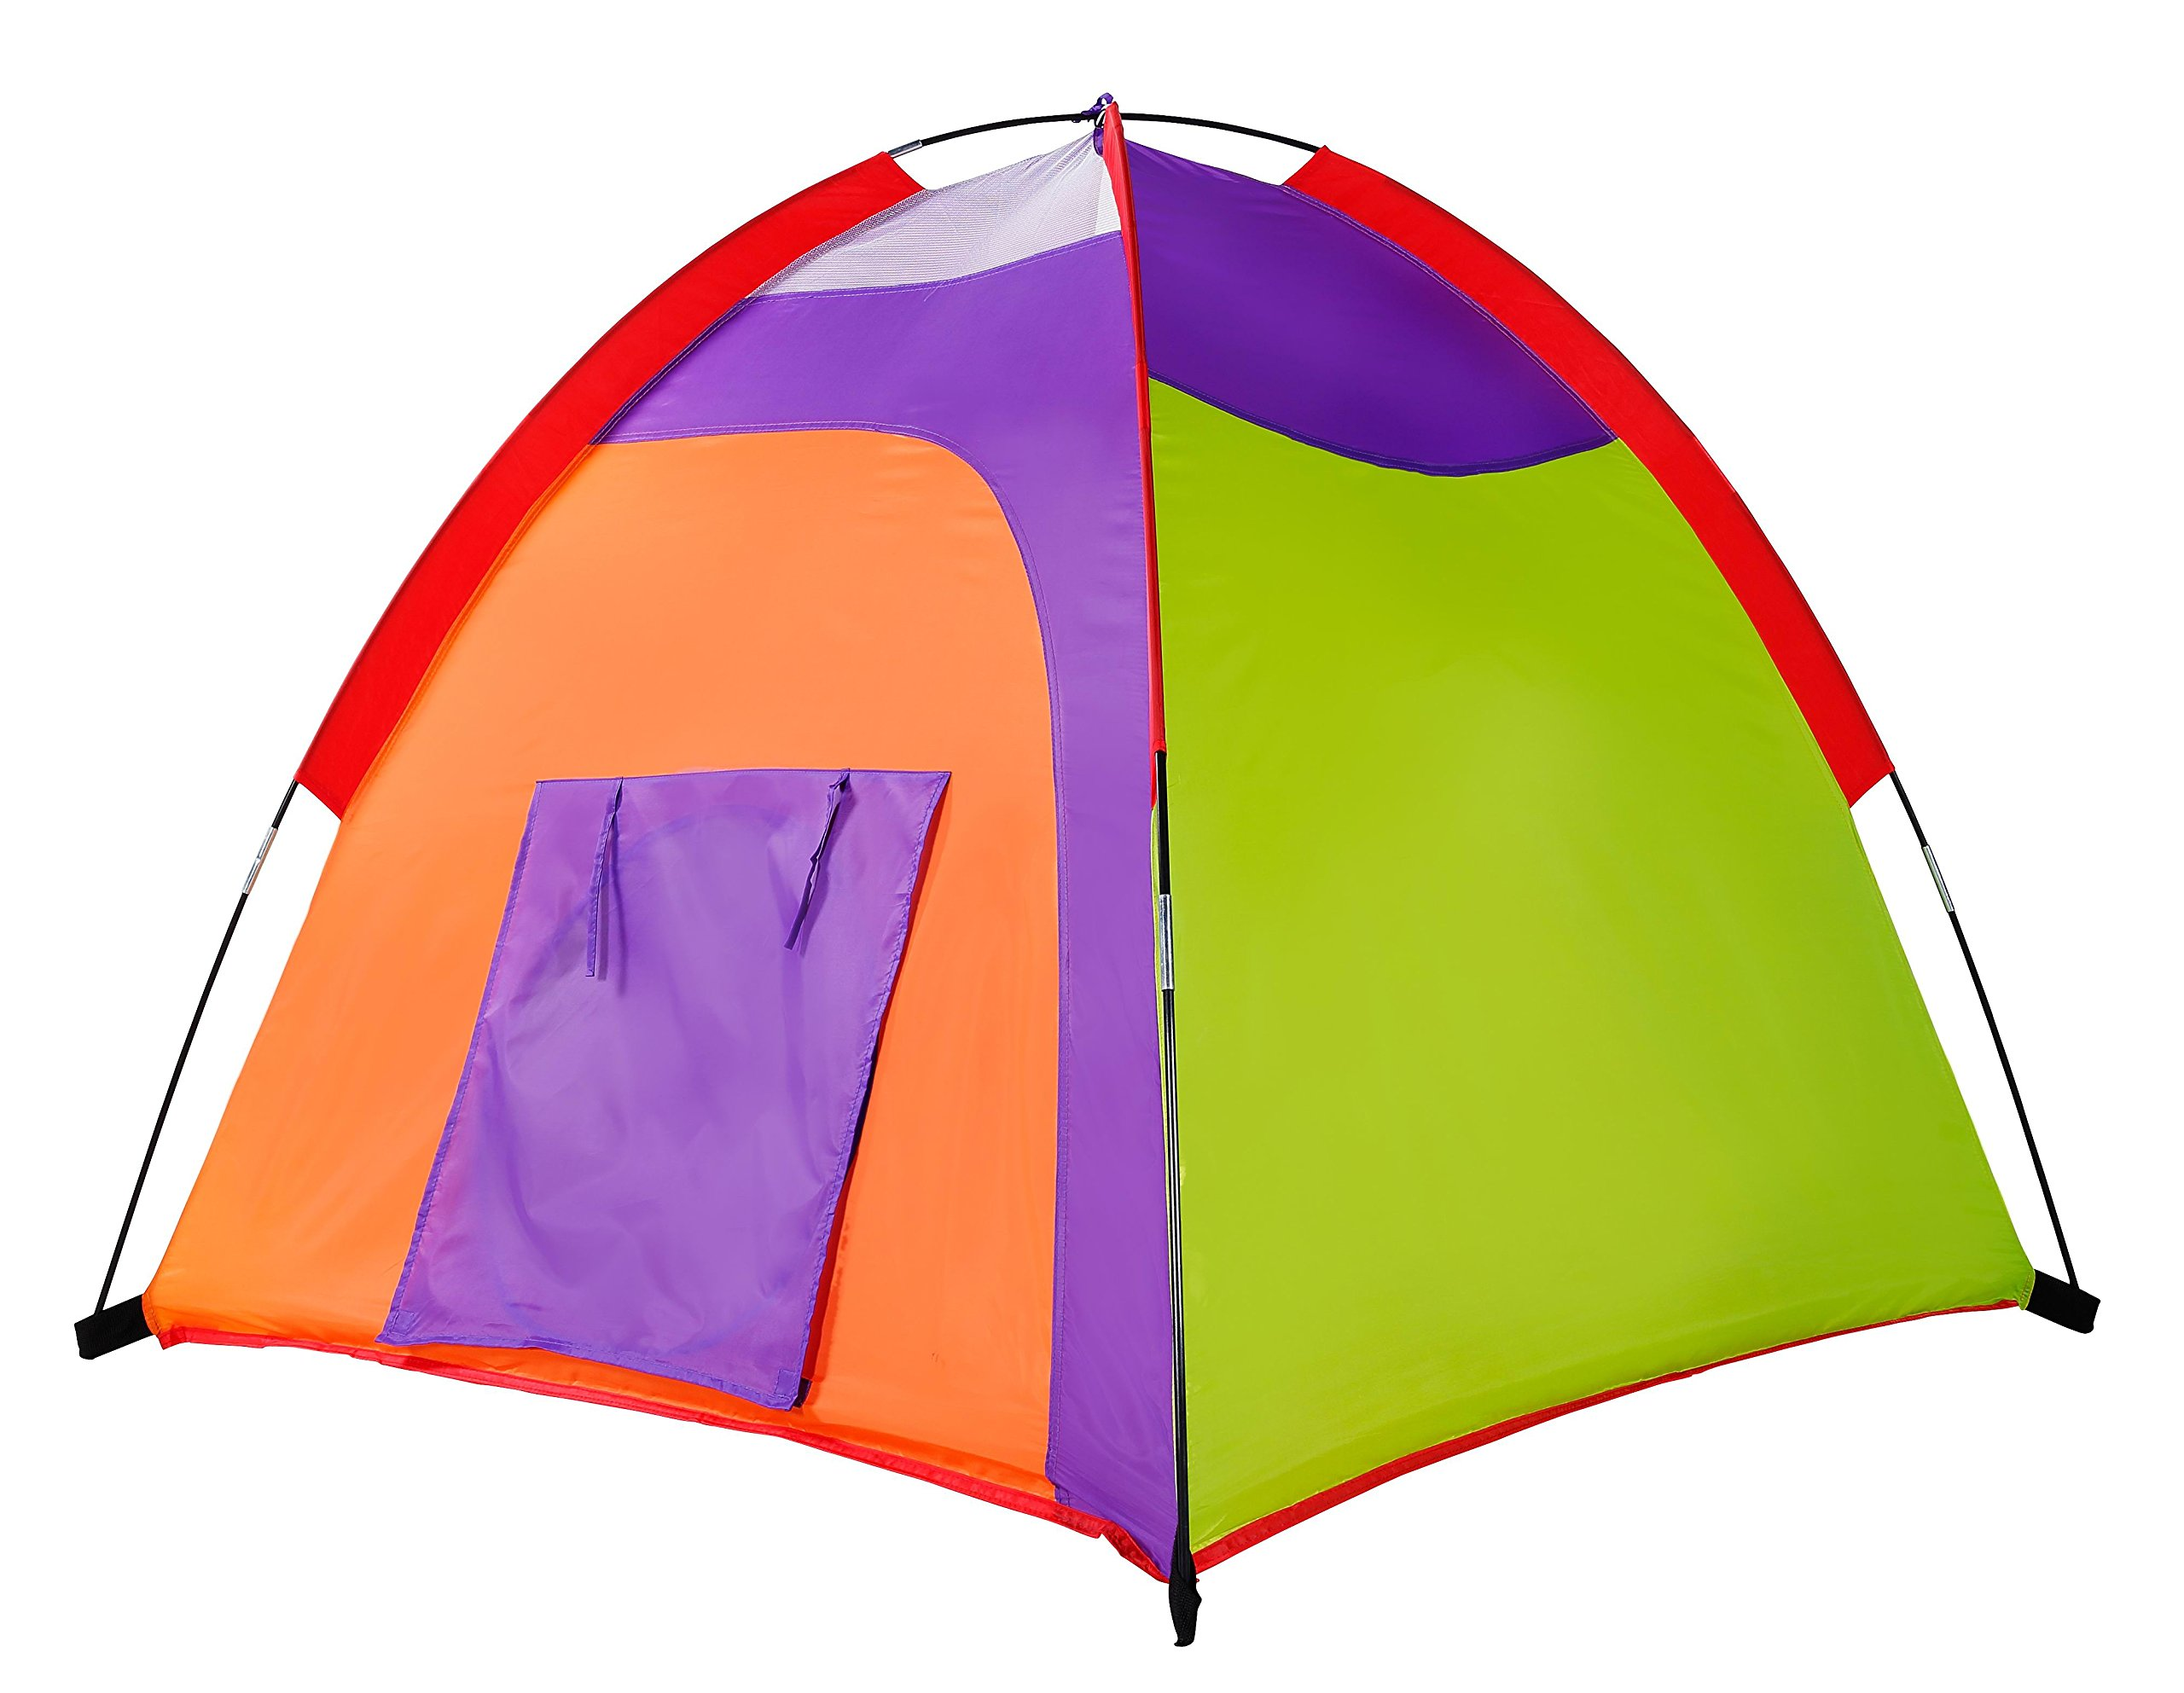 pop up kids tent kids tent colourful curvy play tent pop up tent play tents indoor outdoor. Black Bedroom Furniture Sets. Home Design Ideas